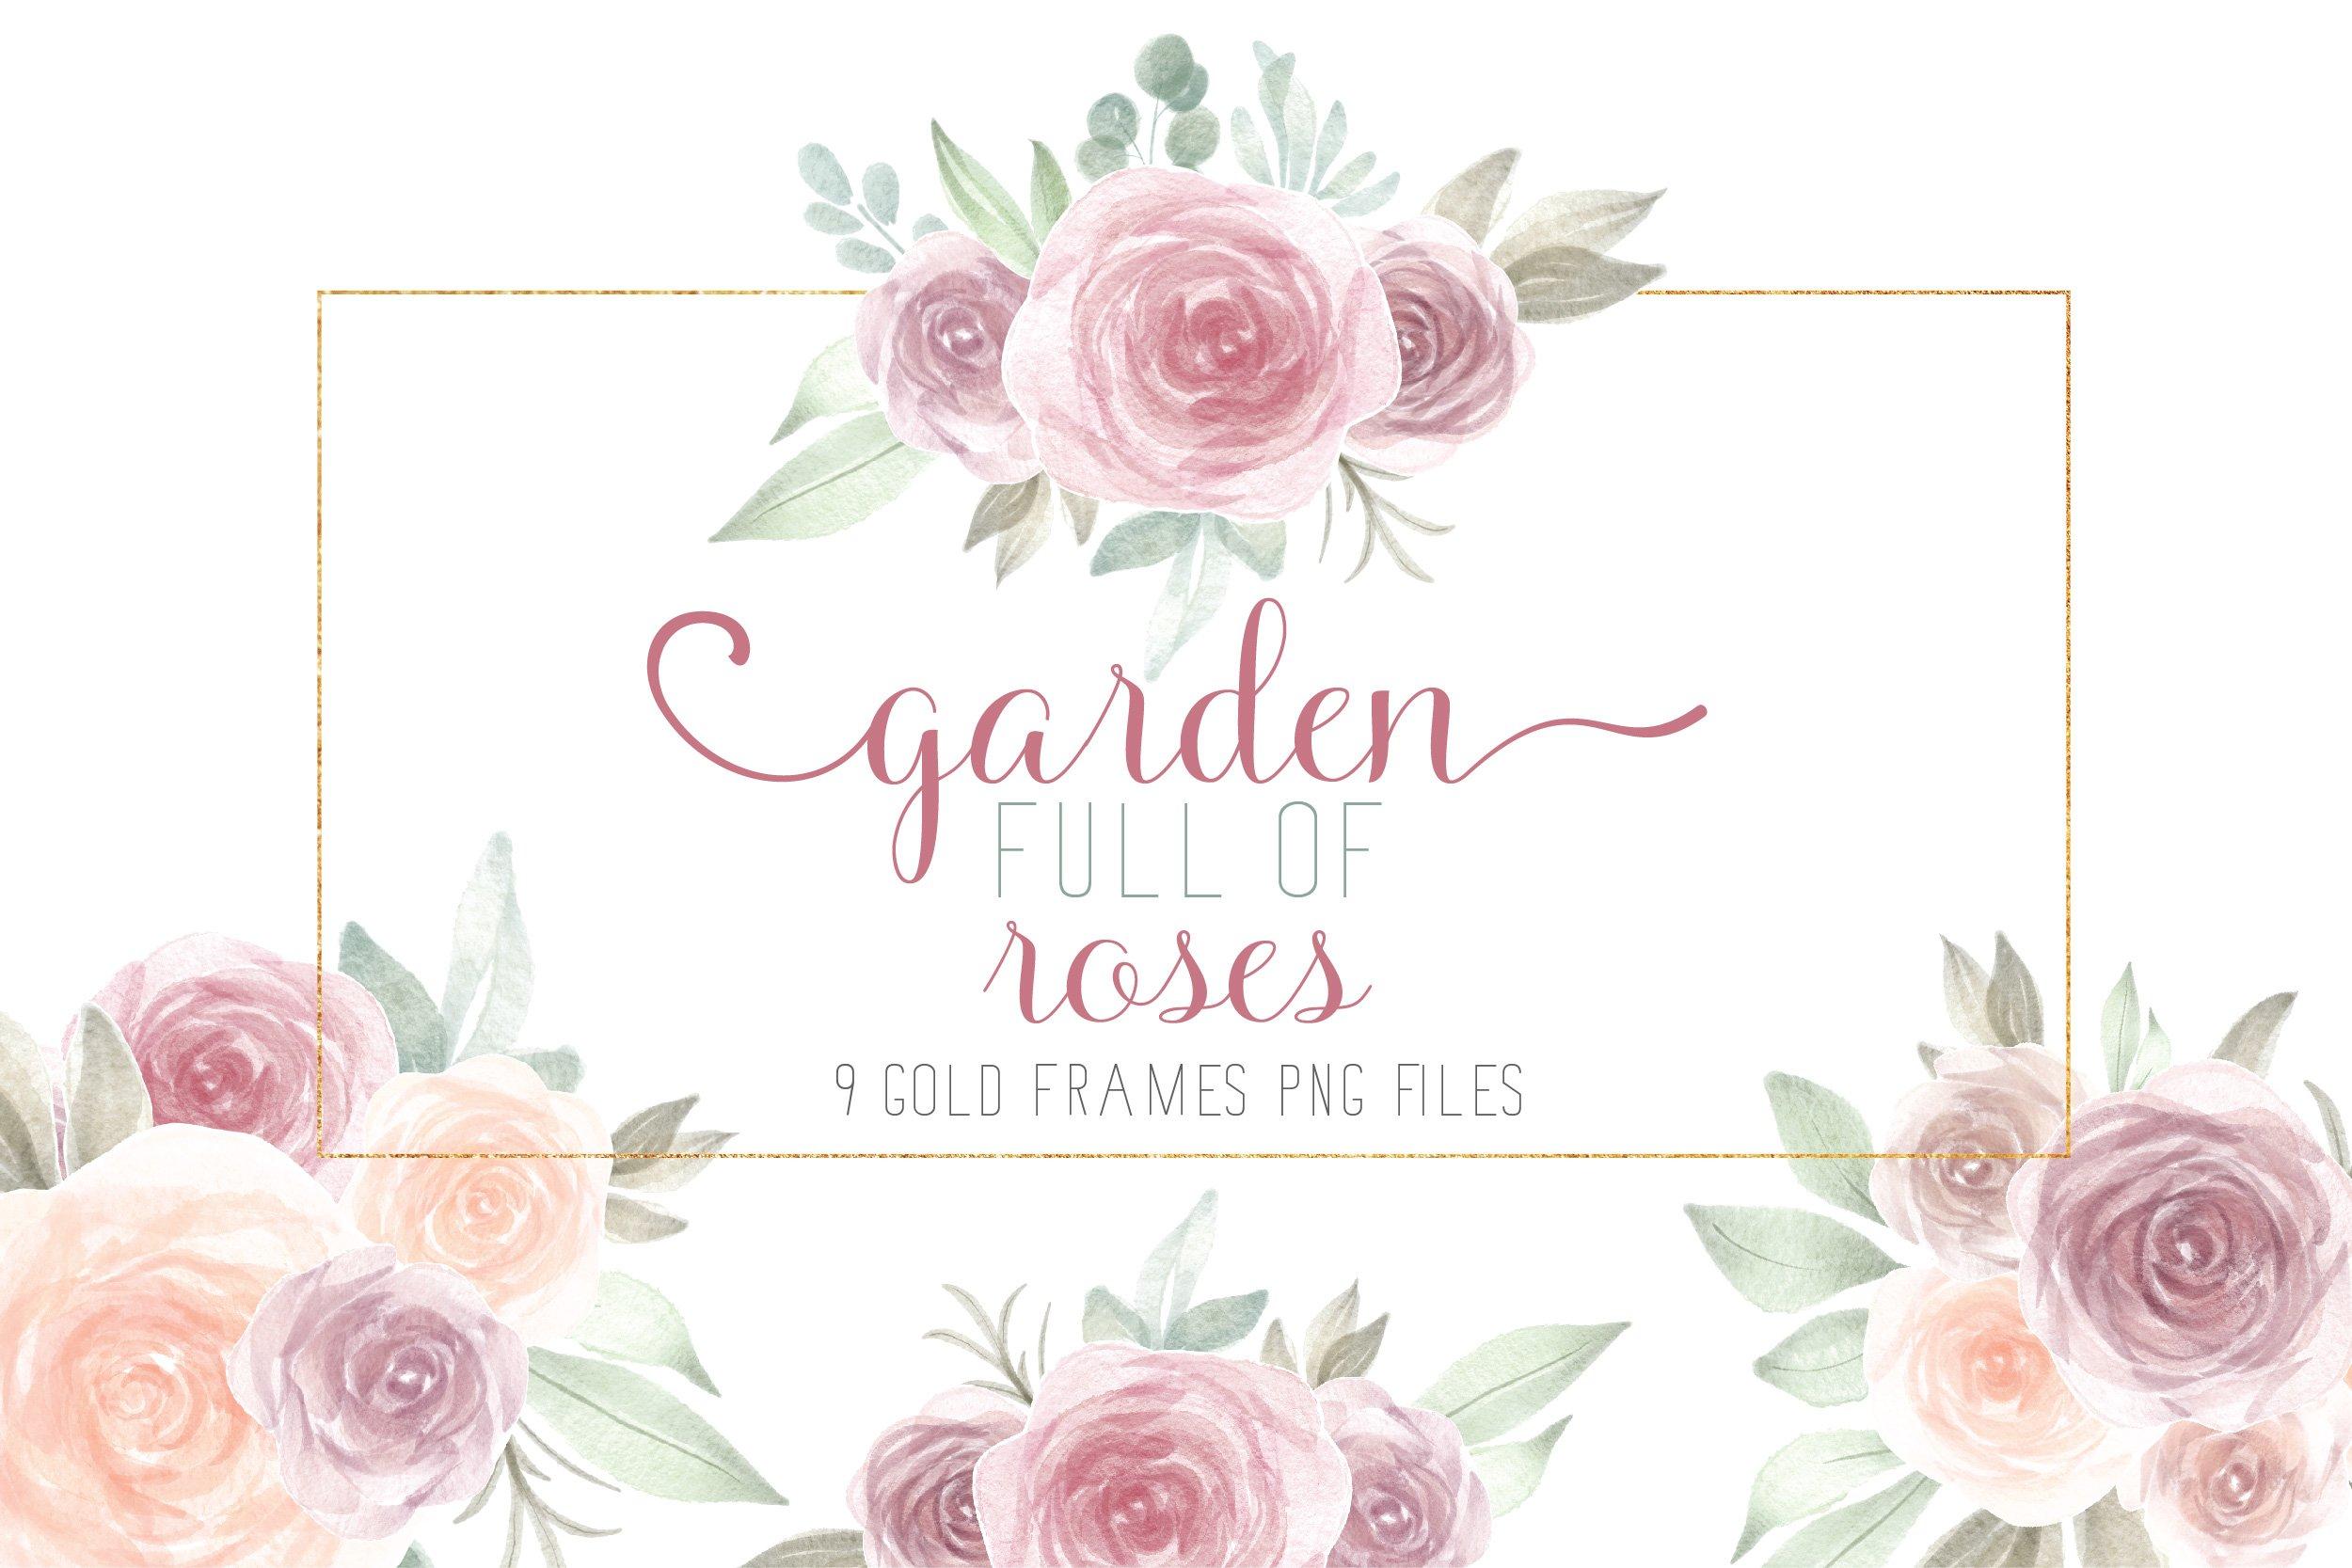 Watercolor Flowers Bouquets With Frames 1033064 Illustrations Design Bundles